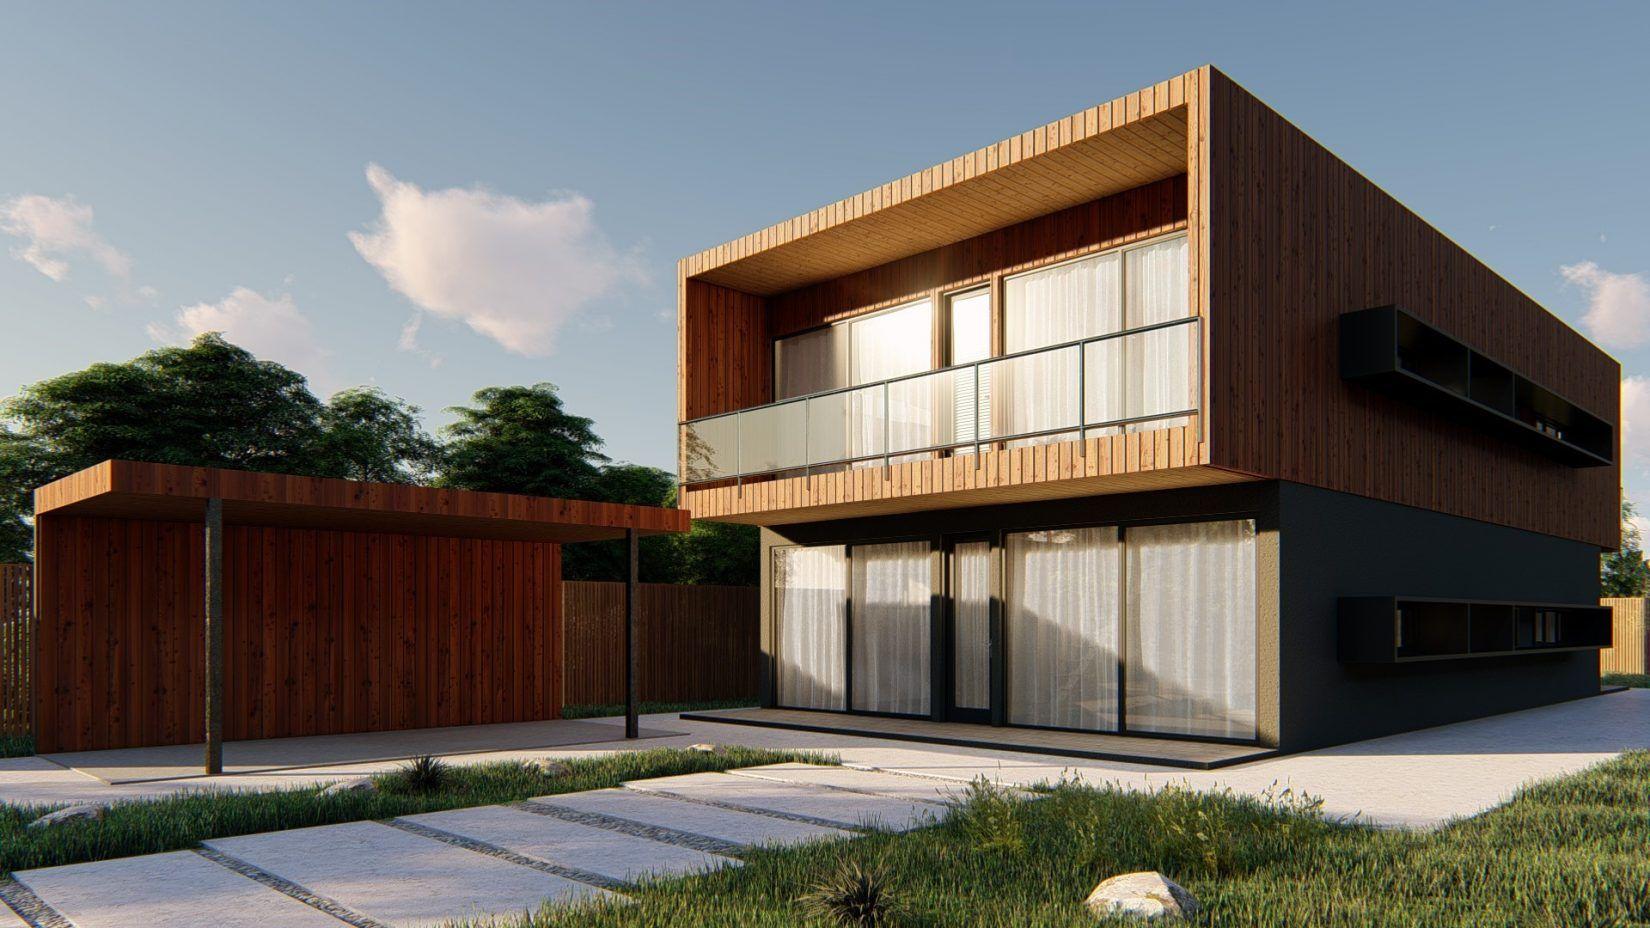 Achlan Kit homes, Kit homes australia